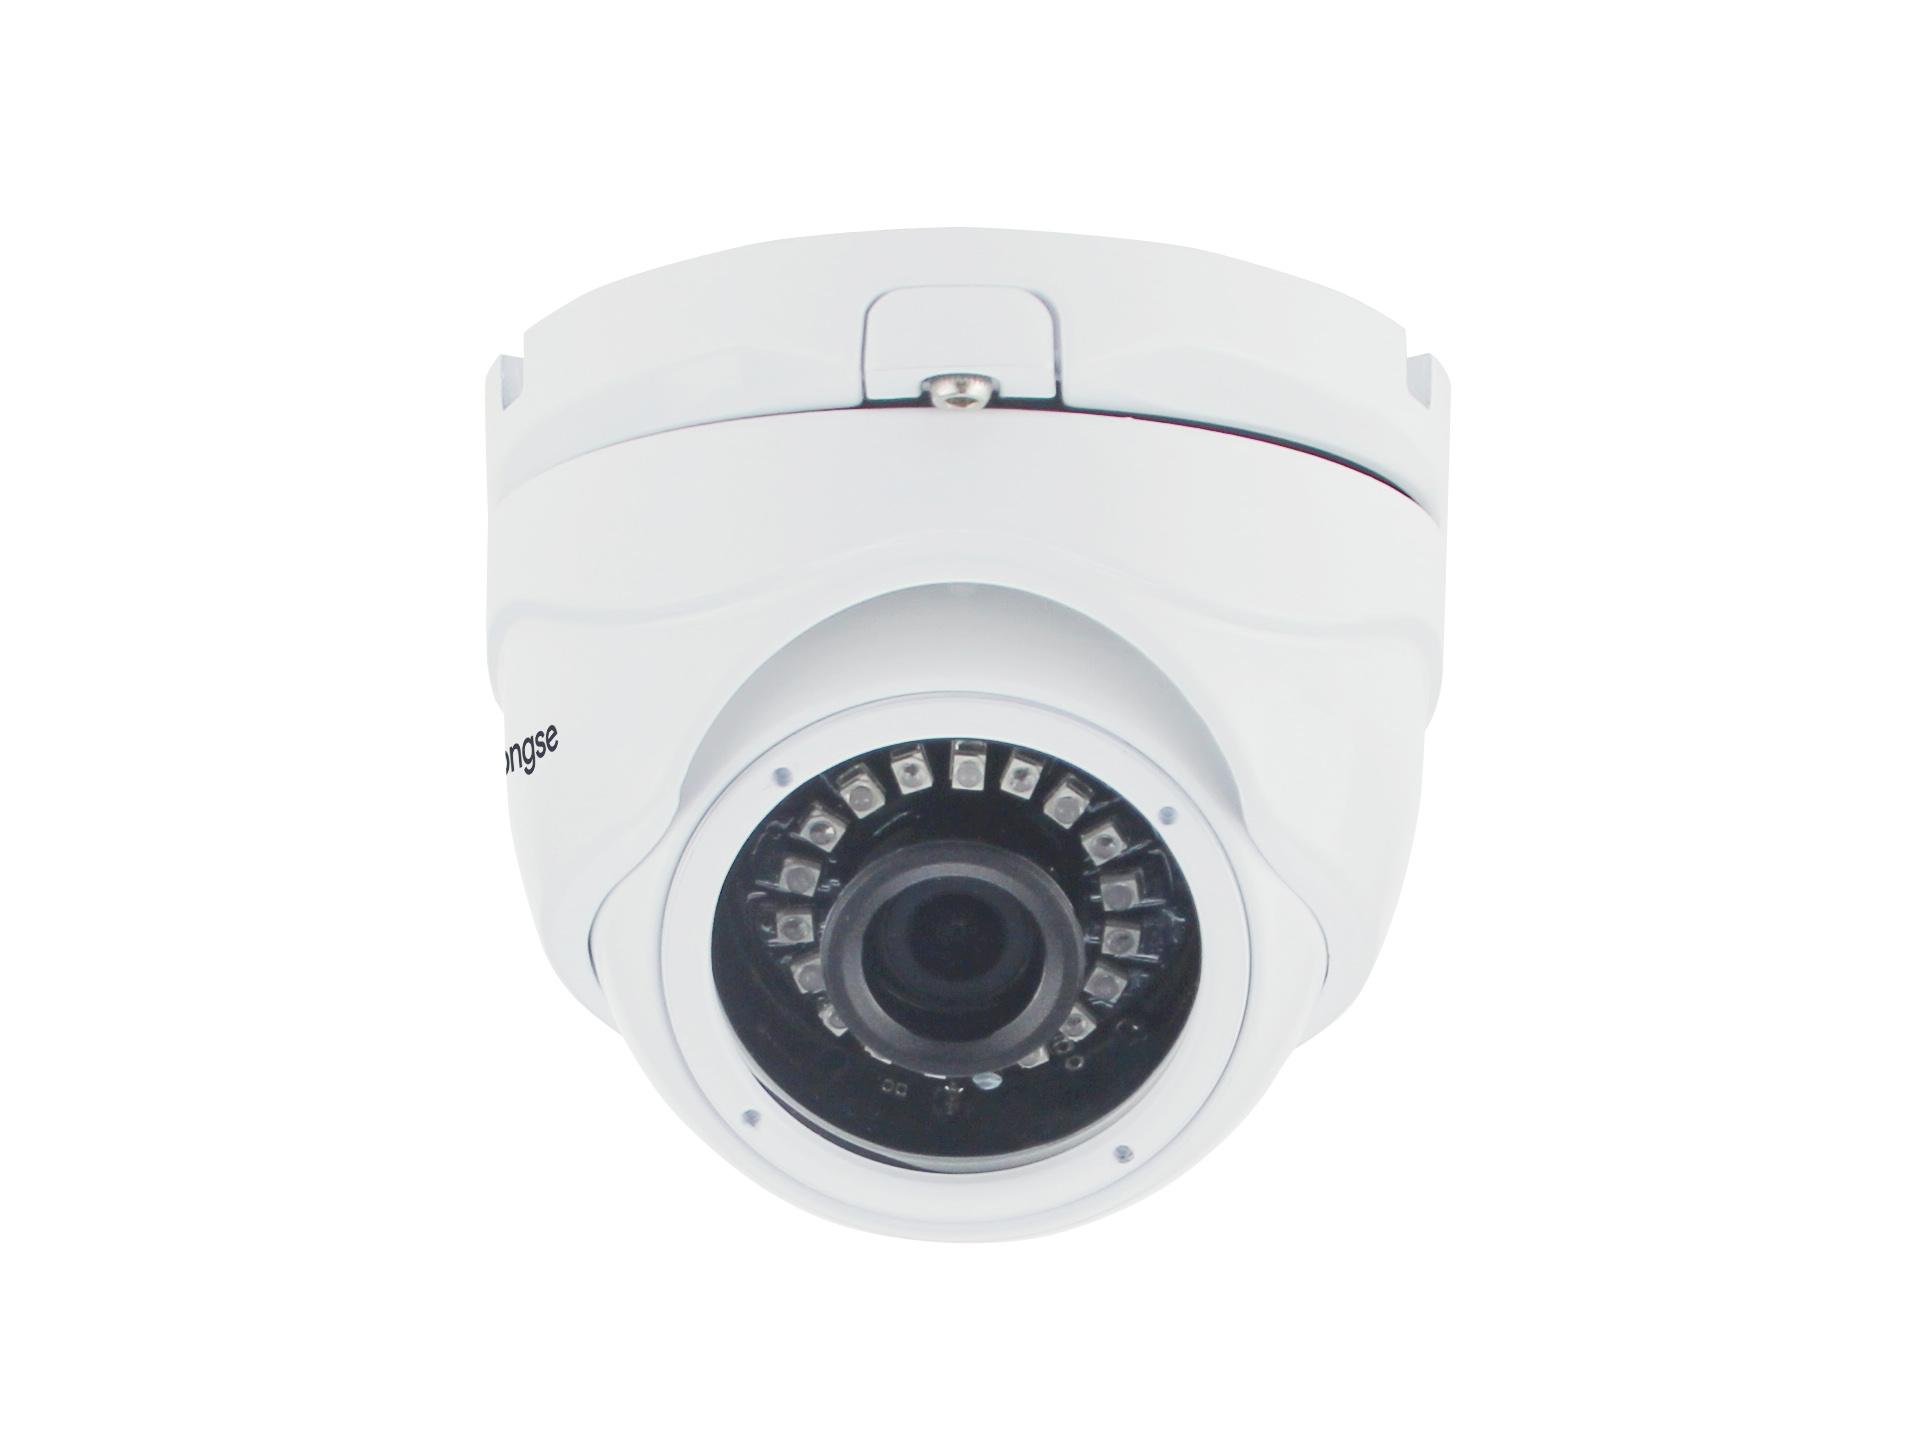 Artikelfoto Longse LIRDGS800 8 Megapixel IP Kamera mit POE und 4mm Objektiv